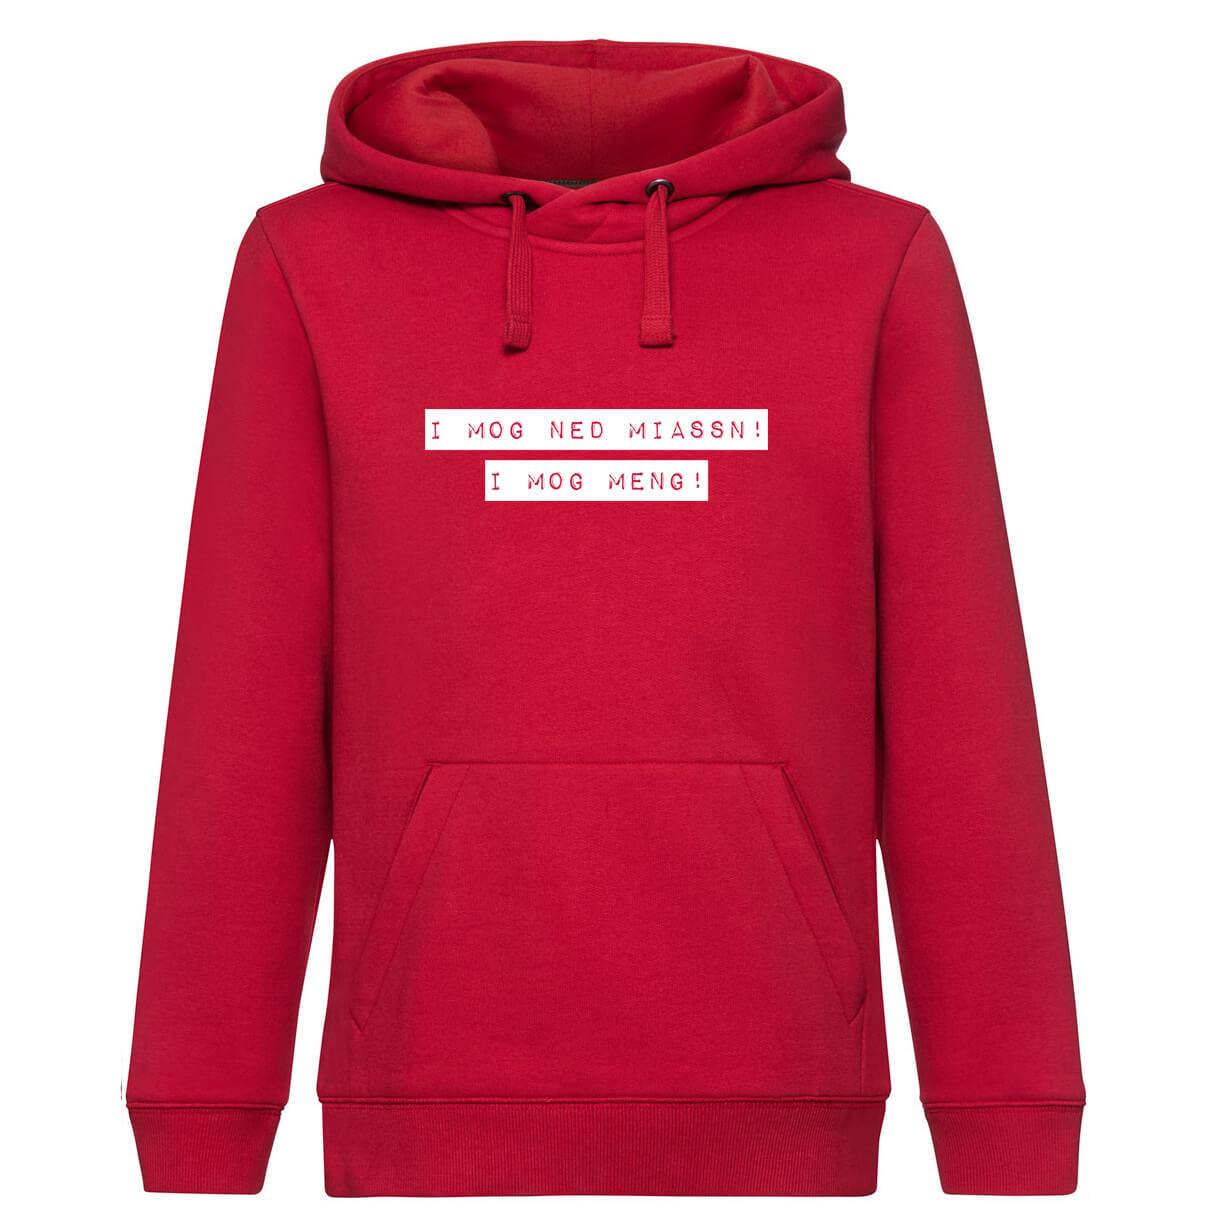 Bayerische T Shirts Hoodies Tops